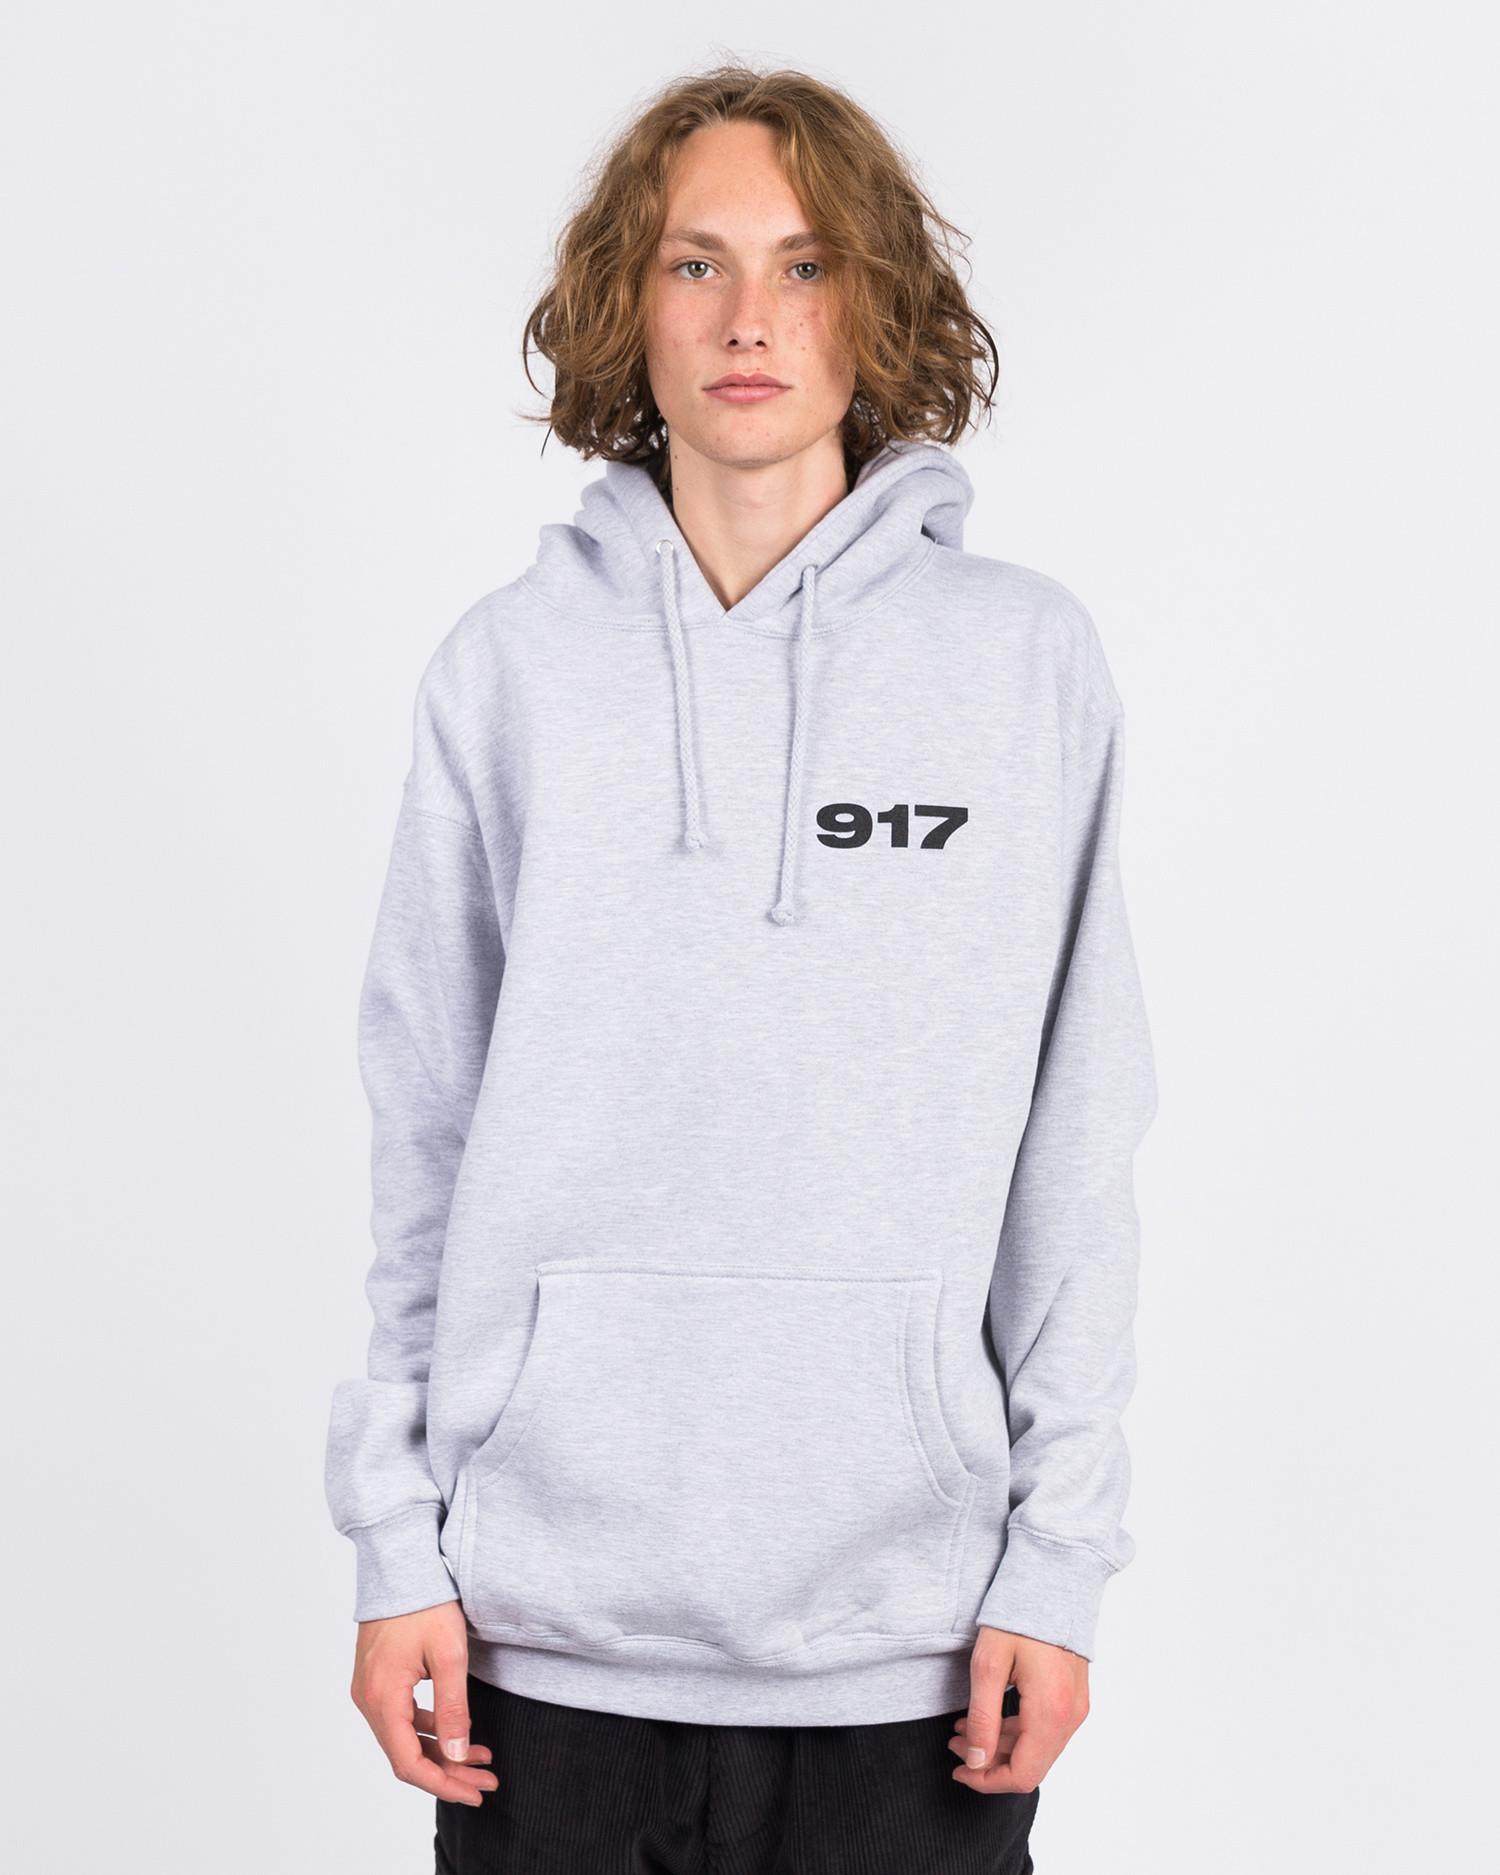 Call Me 917 Bad Baby Pullover Hood Heather Grey